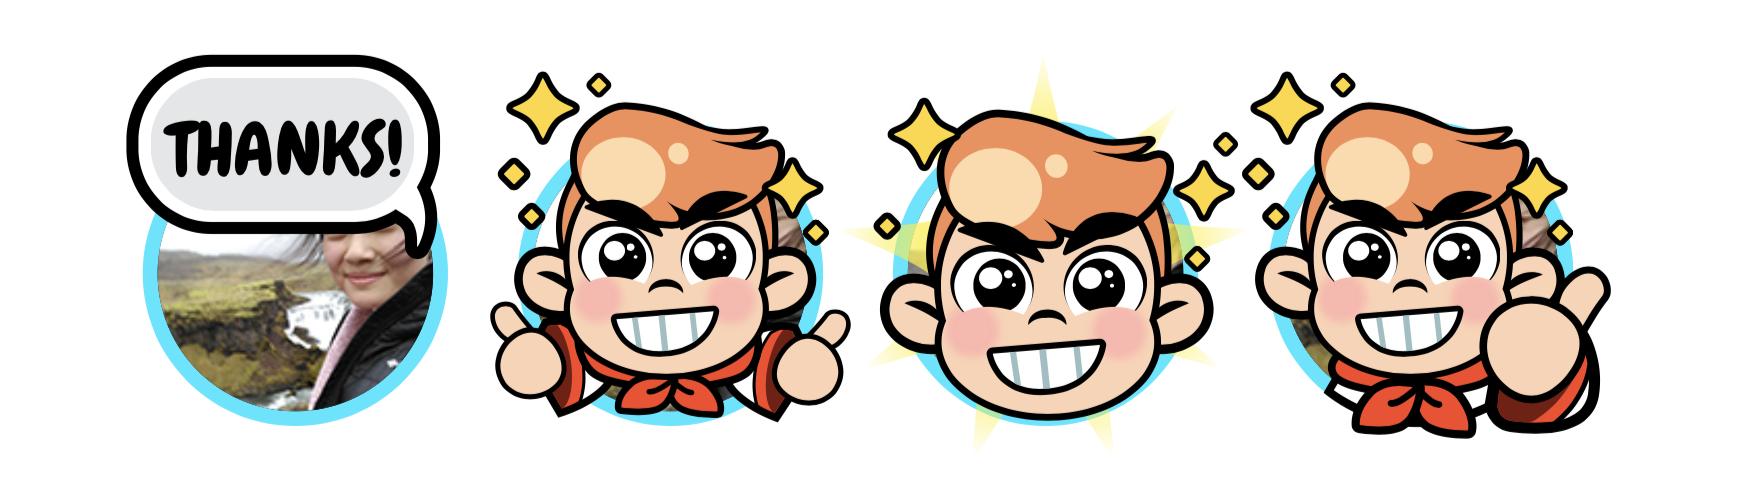 Dish_Emoji_concept.png